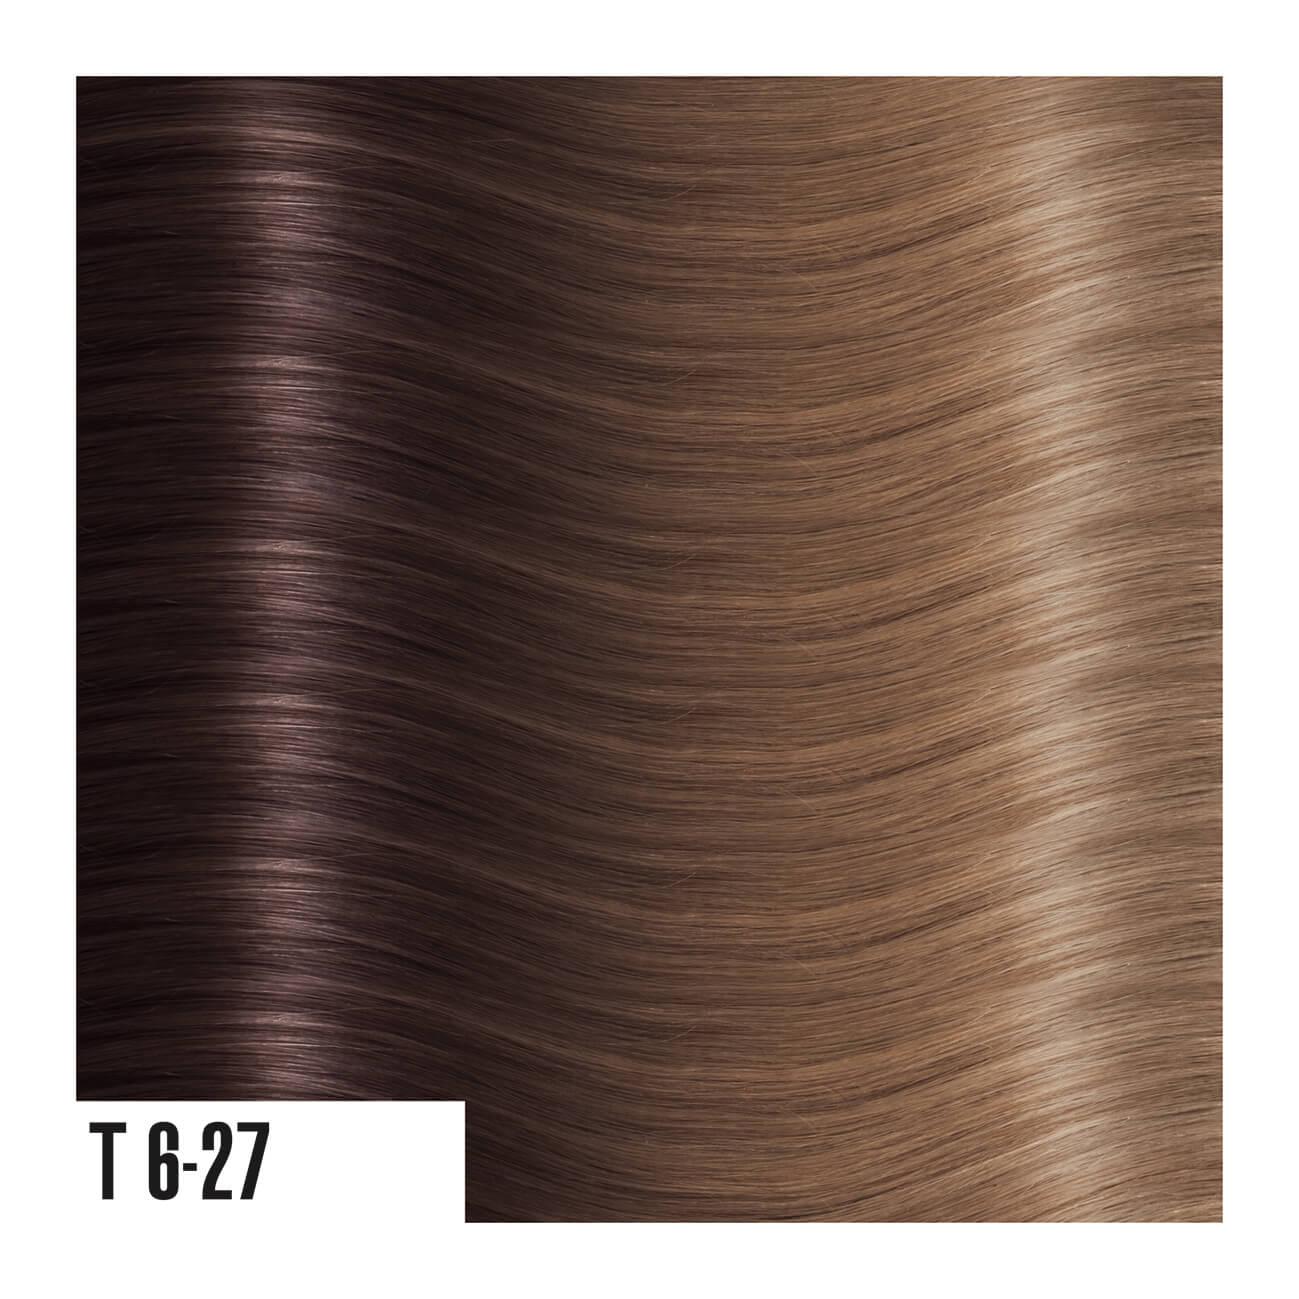 T6-27